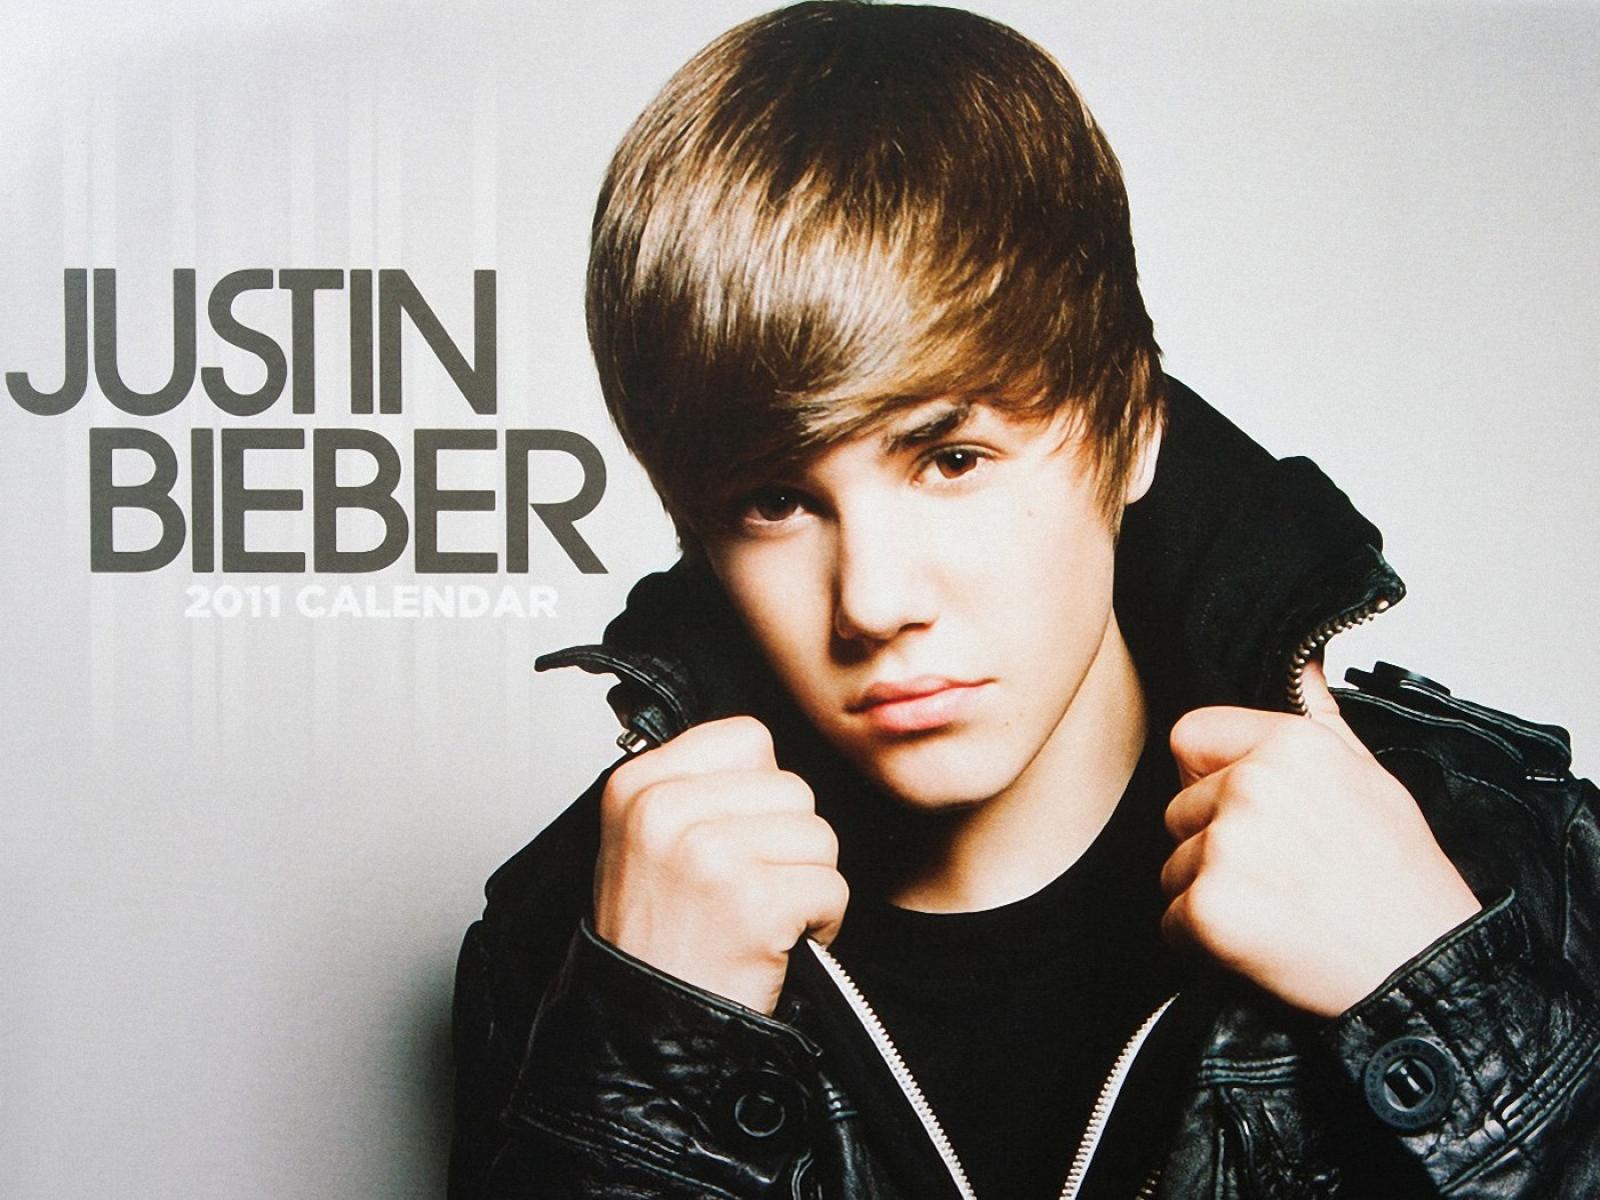 http://4.bp.blogspot.com/-4qwcDJkOf20/UP65J6S3LuI/AAAAAAAAF0w/J6ggnWNRTRQ/s1600/Justin+Bieber+Wallpaper+HD+2013+15.jpg